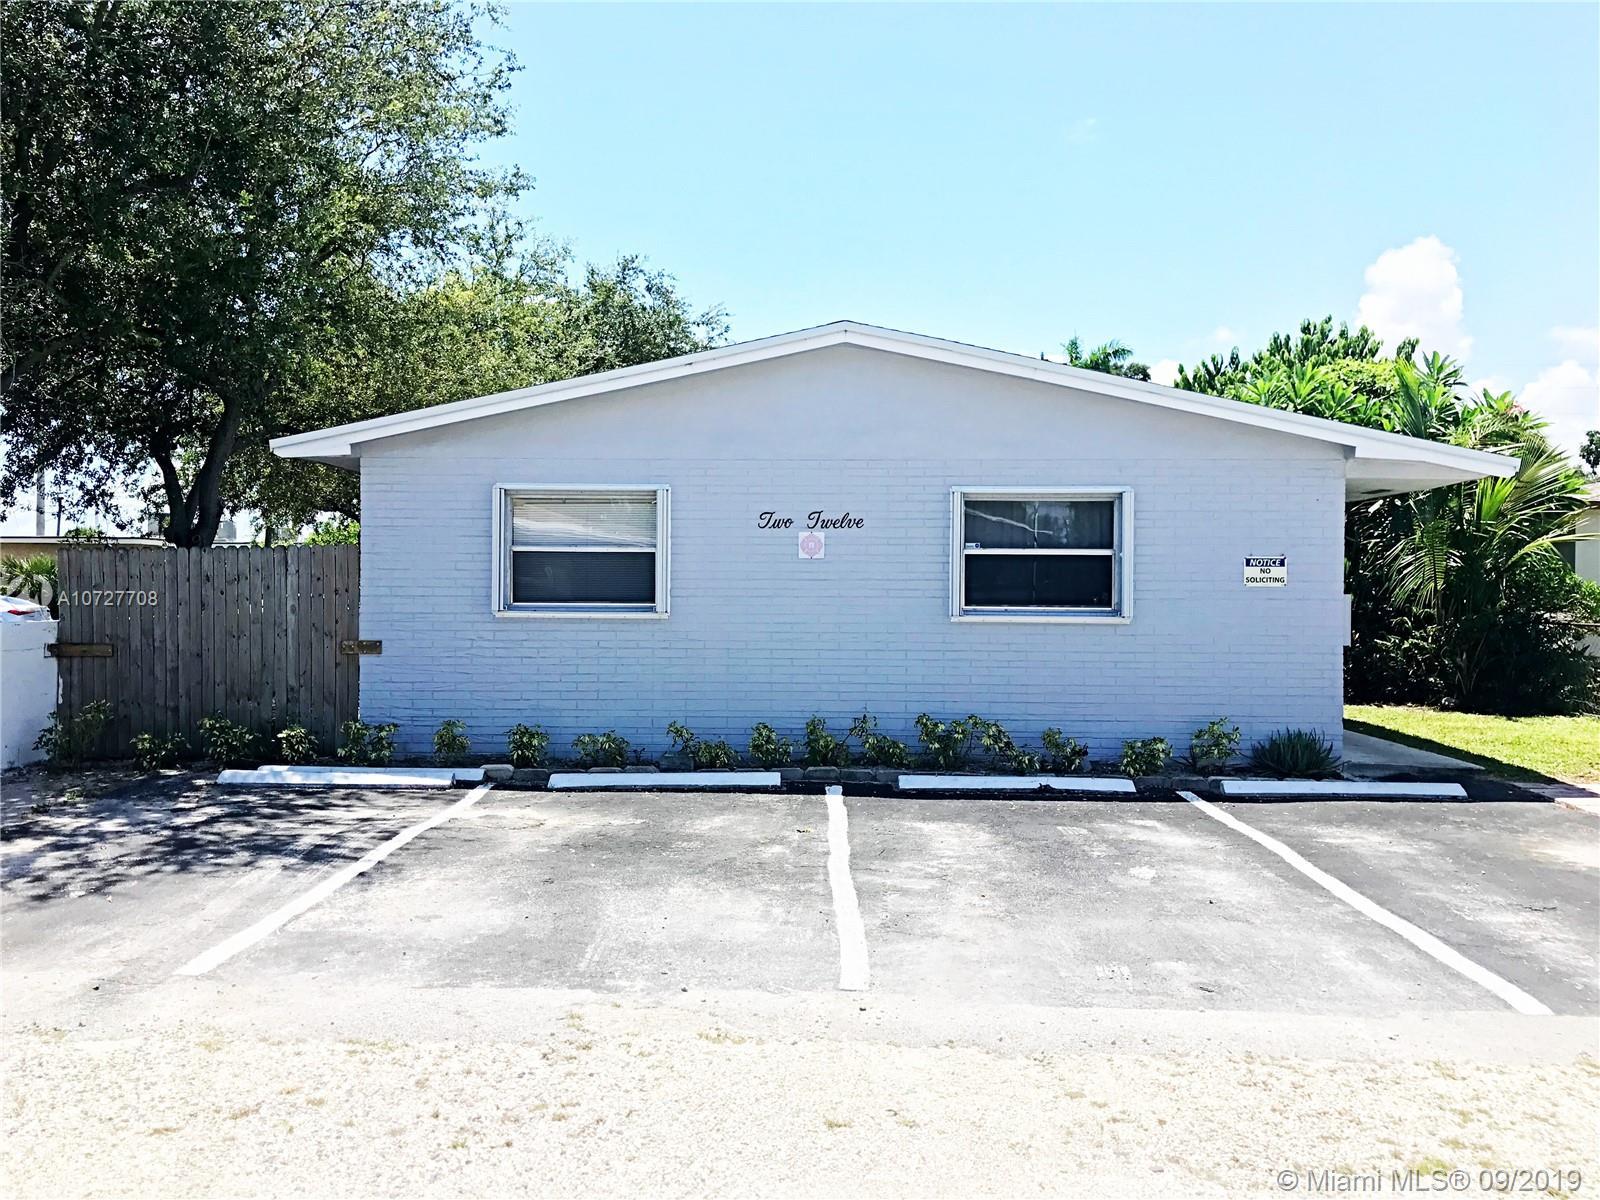 212 SW 22nd St, Fort Lauderdale, FL 33315